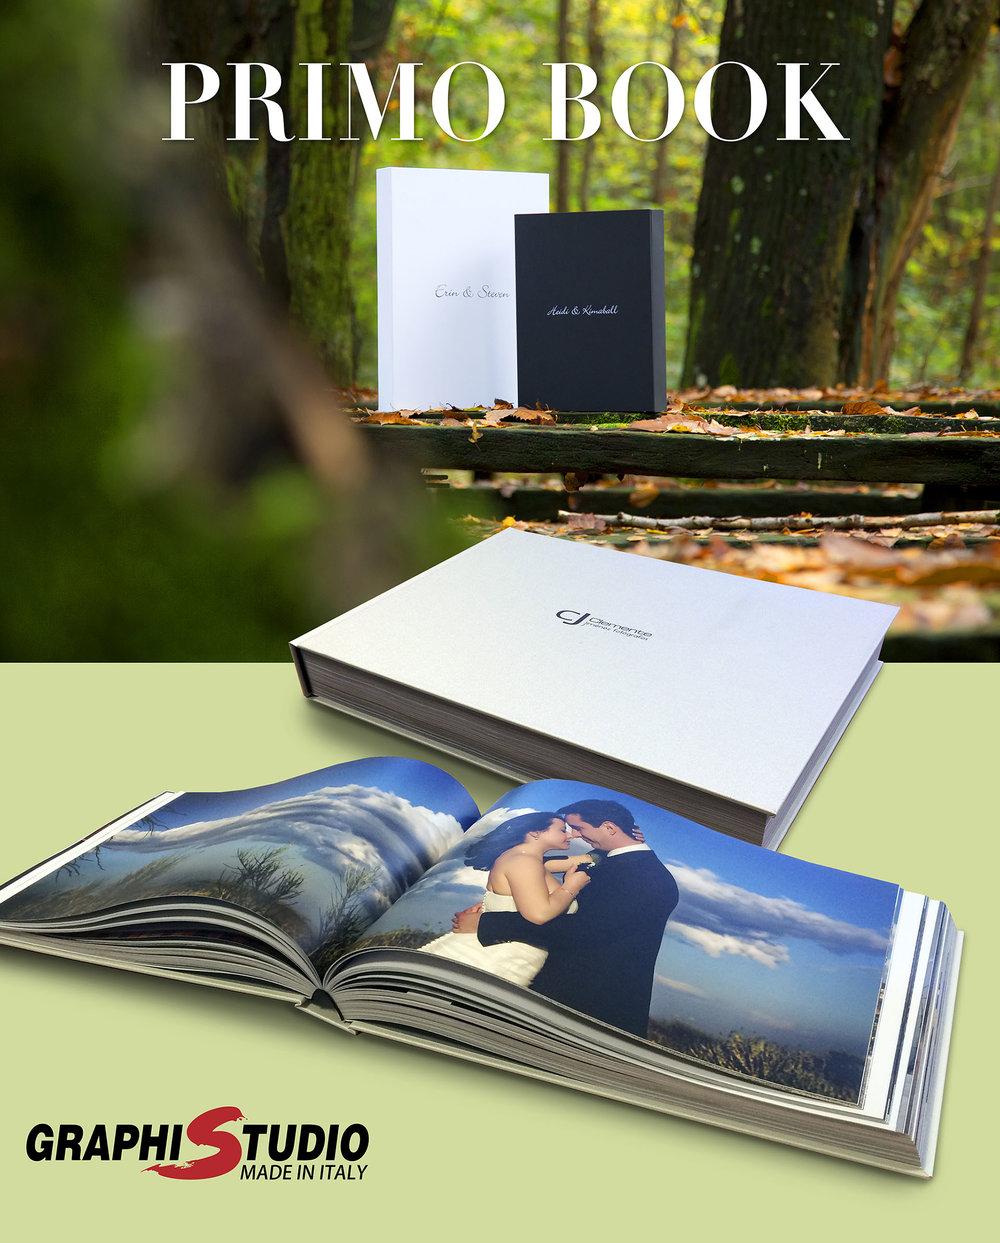 Primo-book-1 for web.jpg